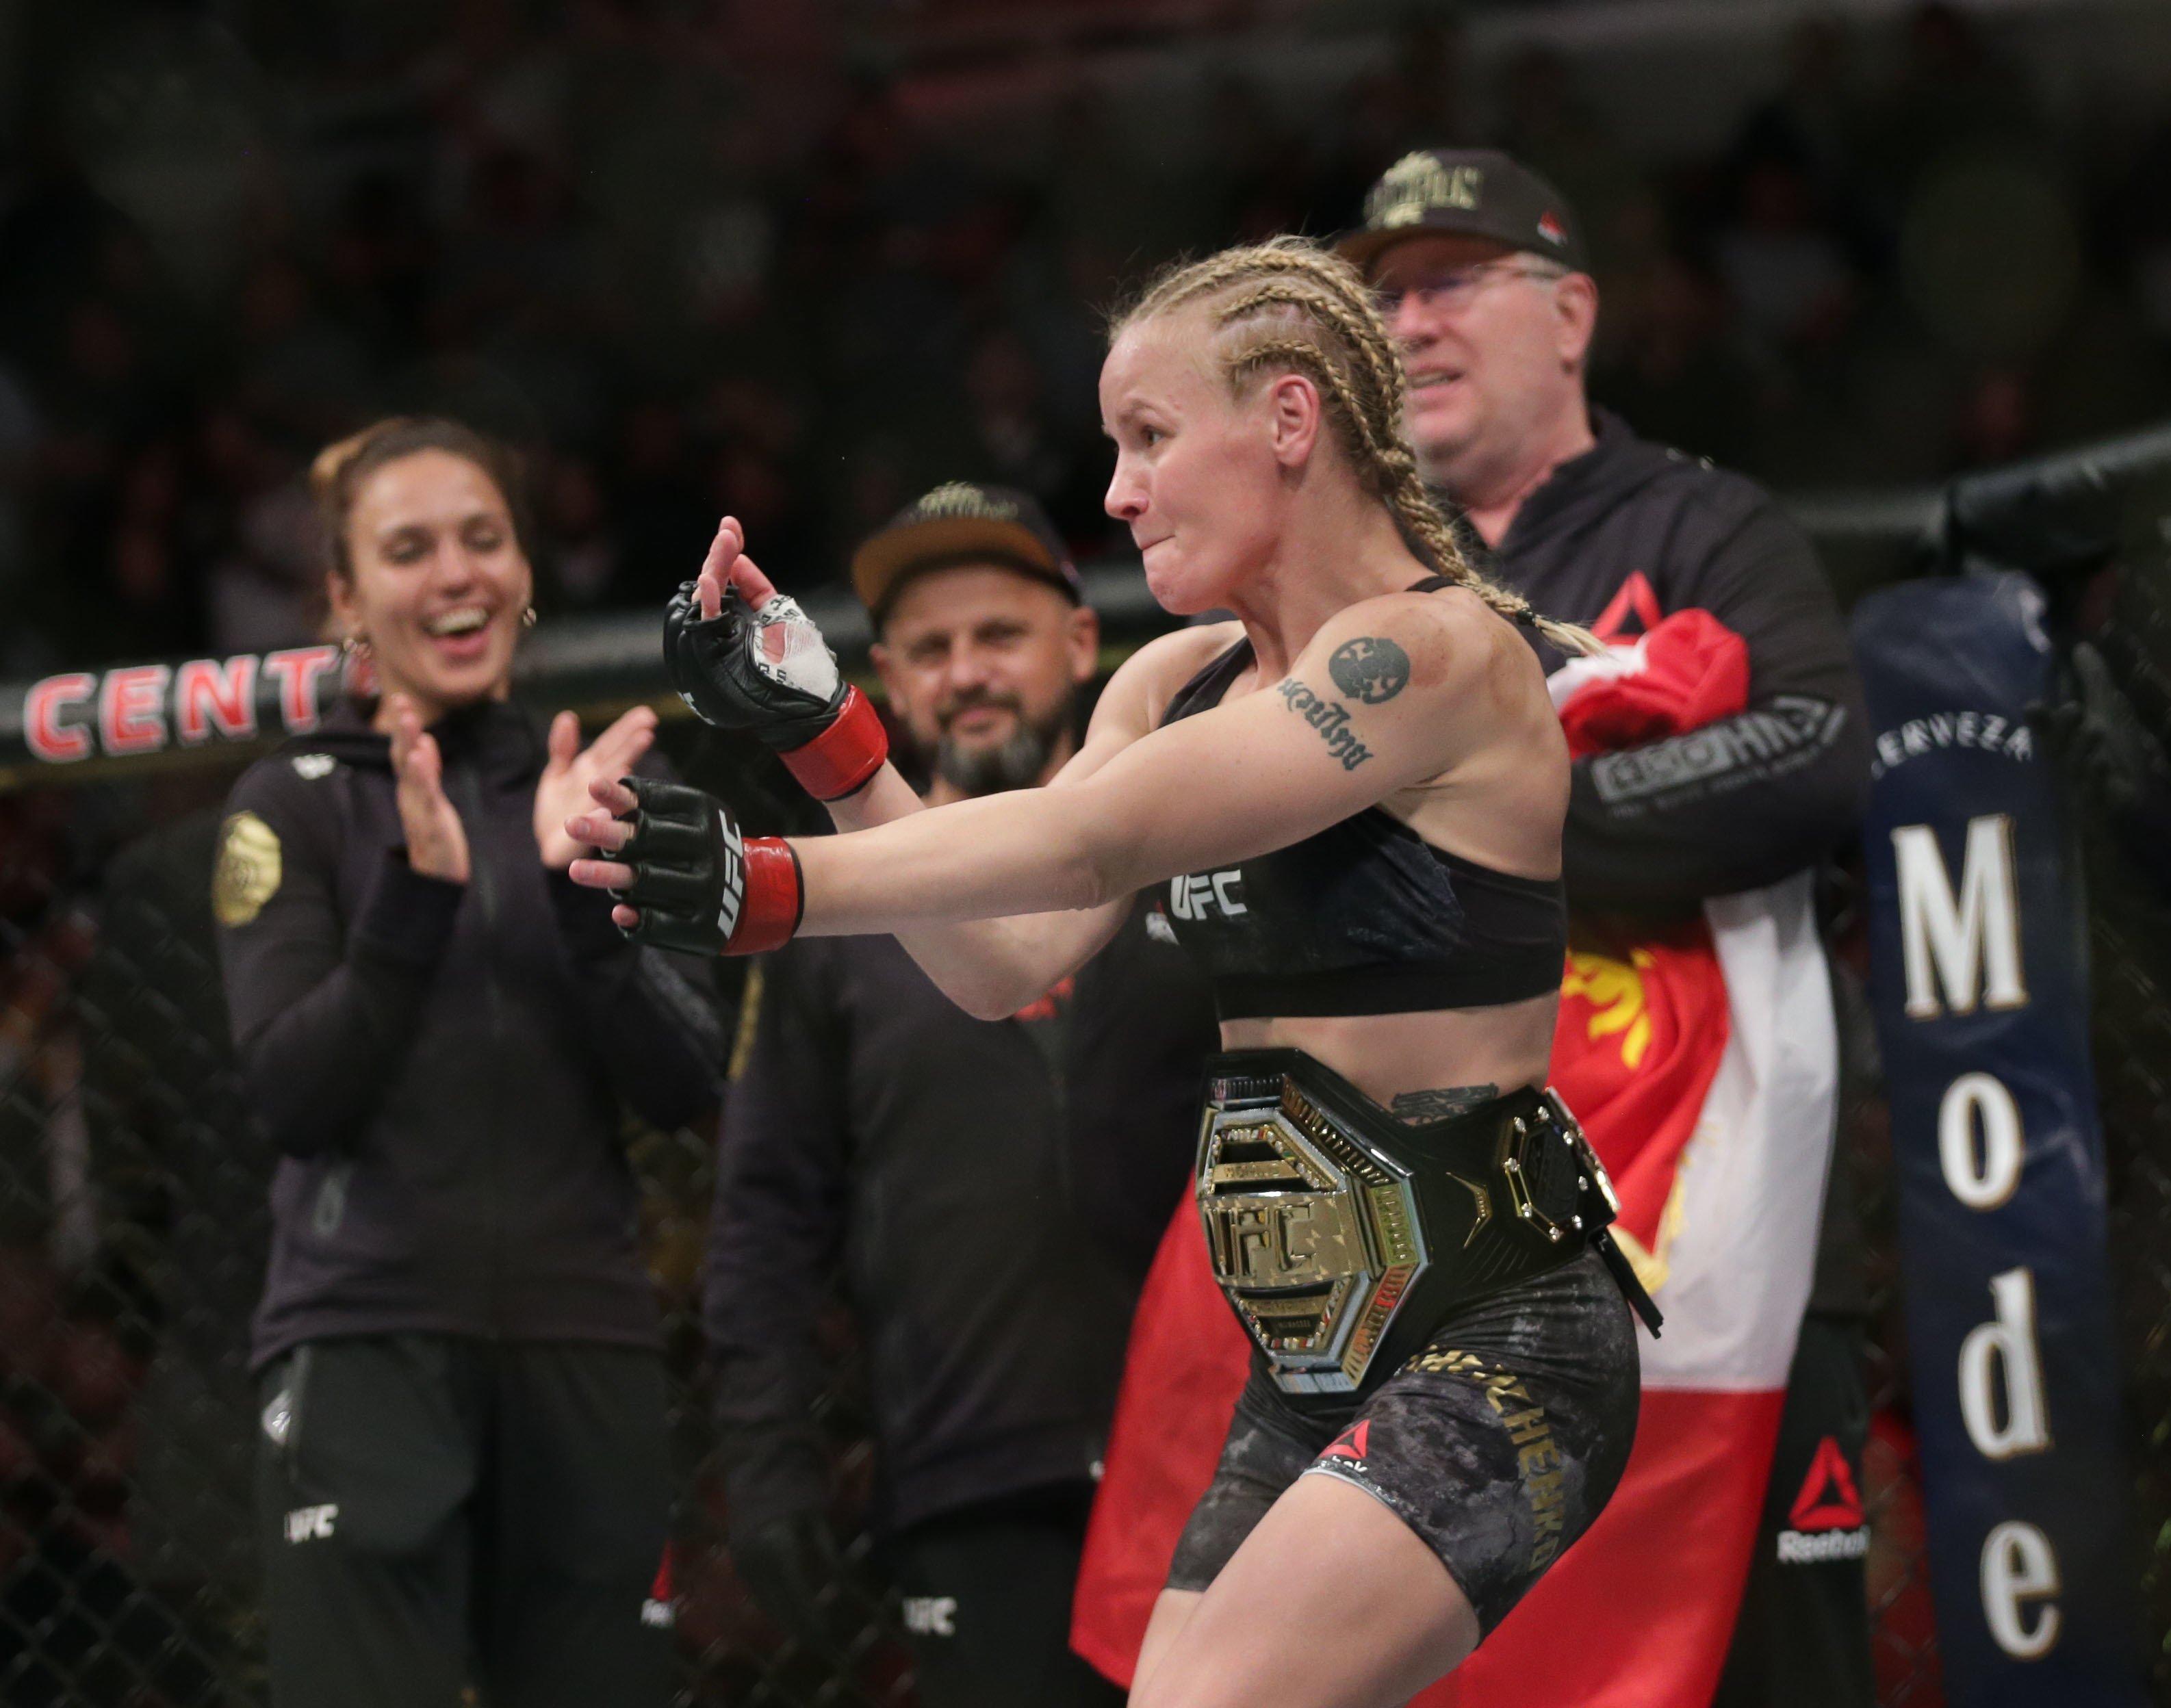 MMA star Valentina Shevchenko dismisses talk of super-fights with Amanda Nunes or Weili Zhang ahead of Katlyn Chookagian clash at UFC 247